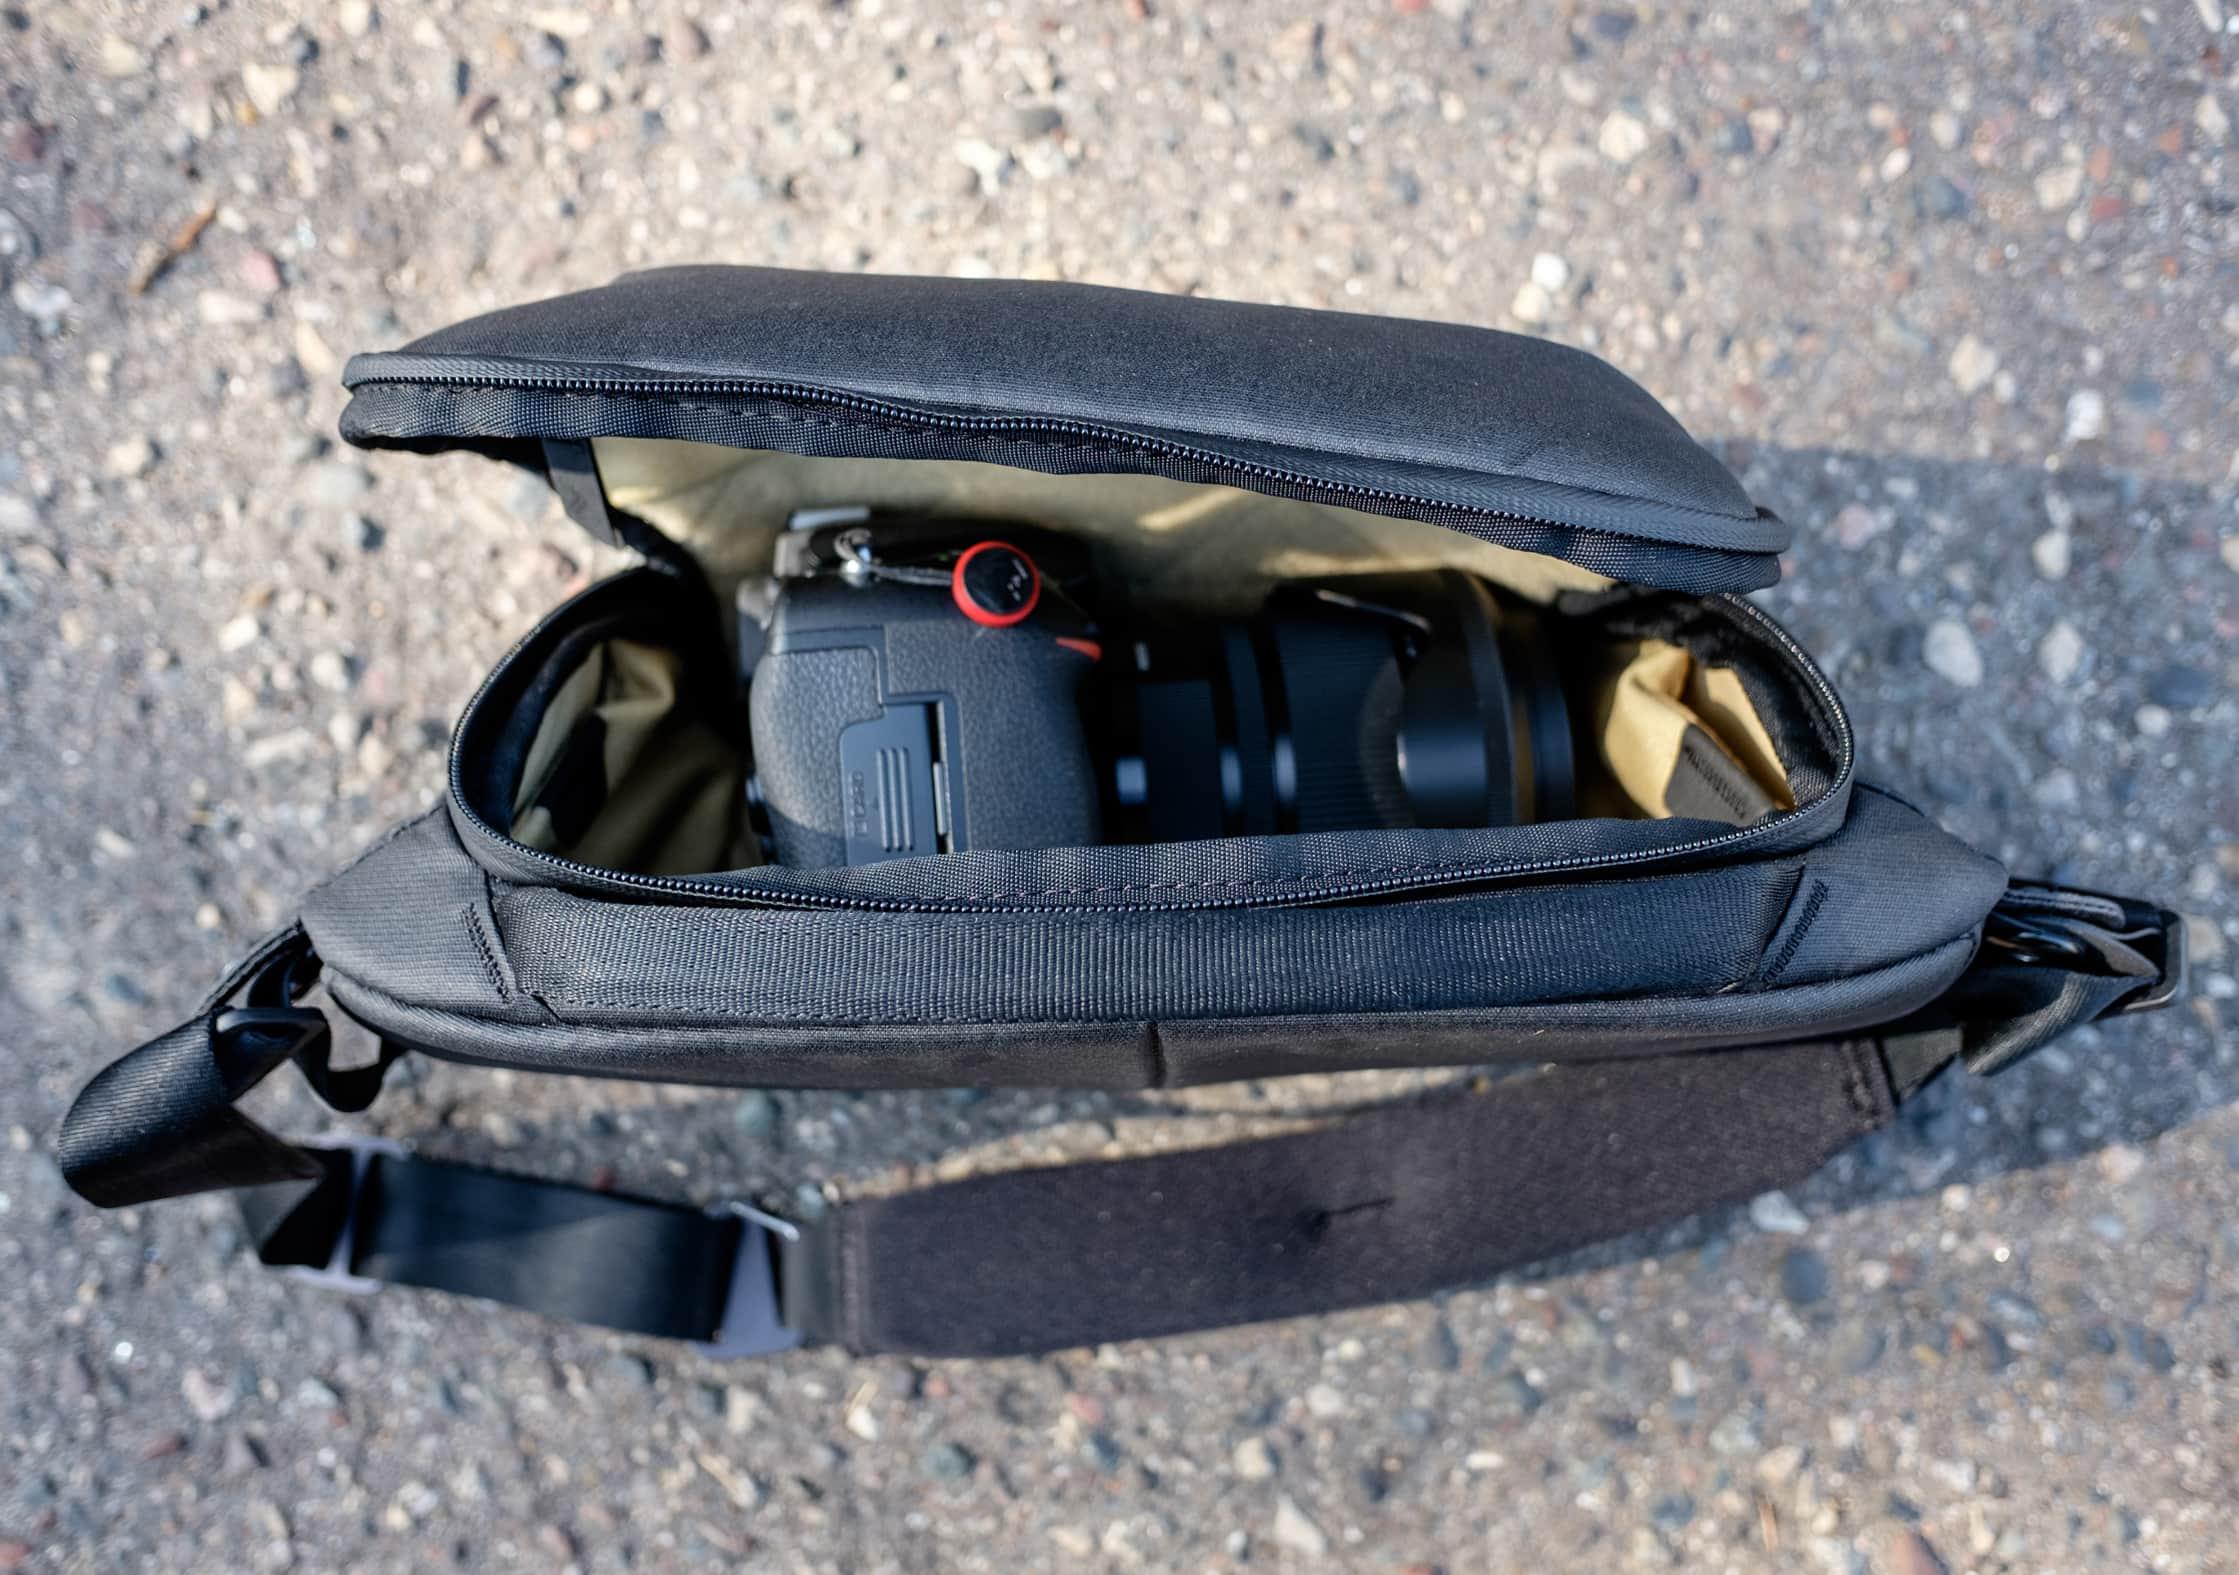 Peak Design Everyday Sling 5L Full-Size Camera Inside